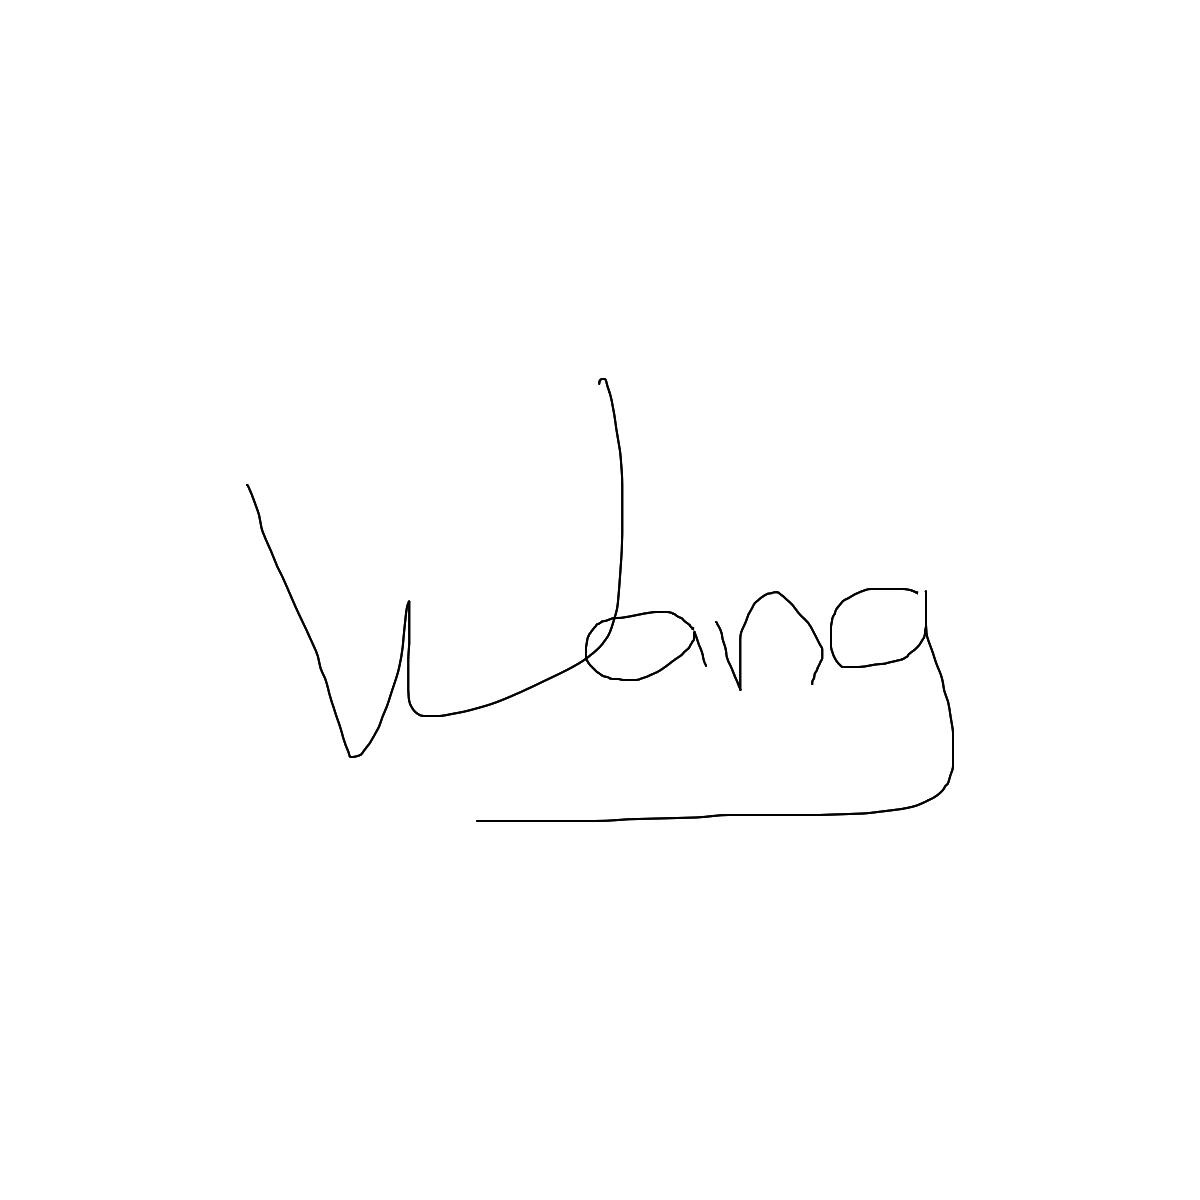 BAAAM drawing#679 lat:-27.6309967041015620lng: 152.7692565917968800